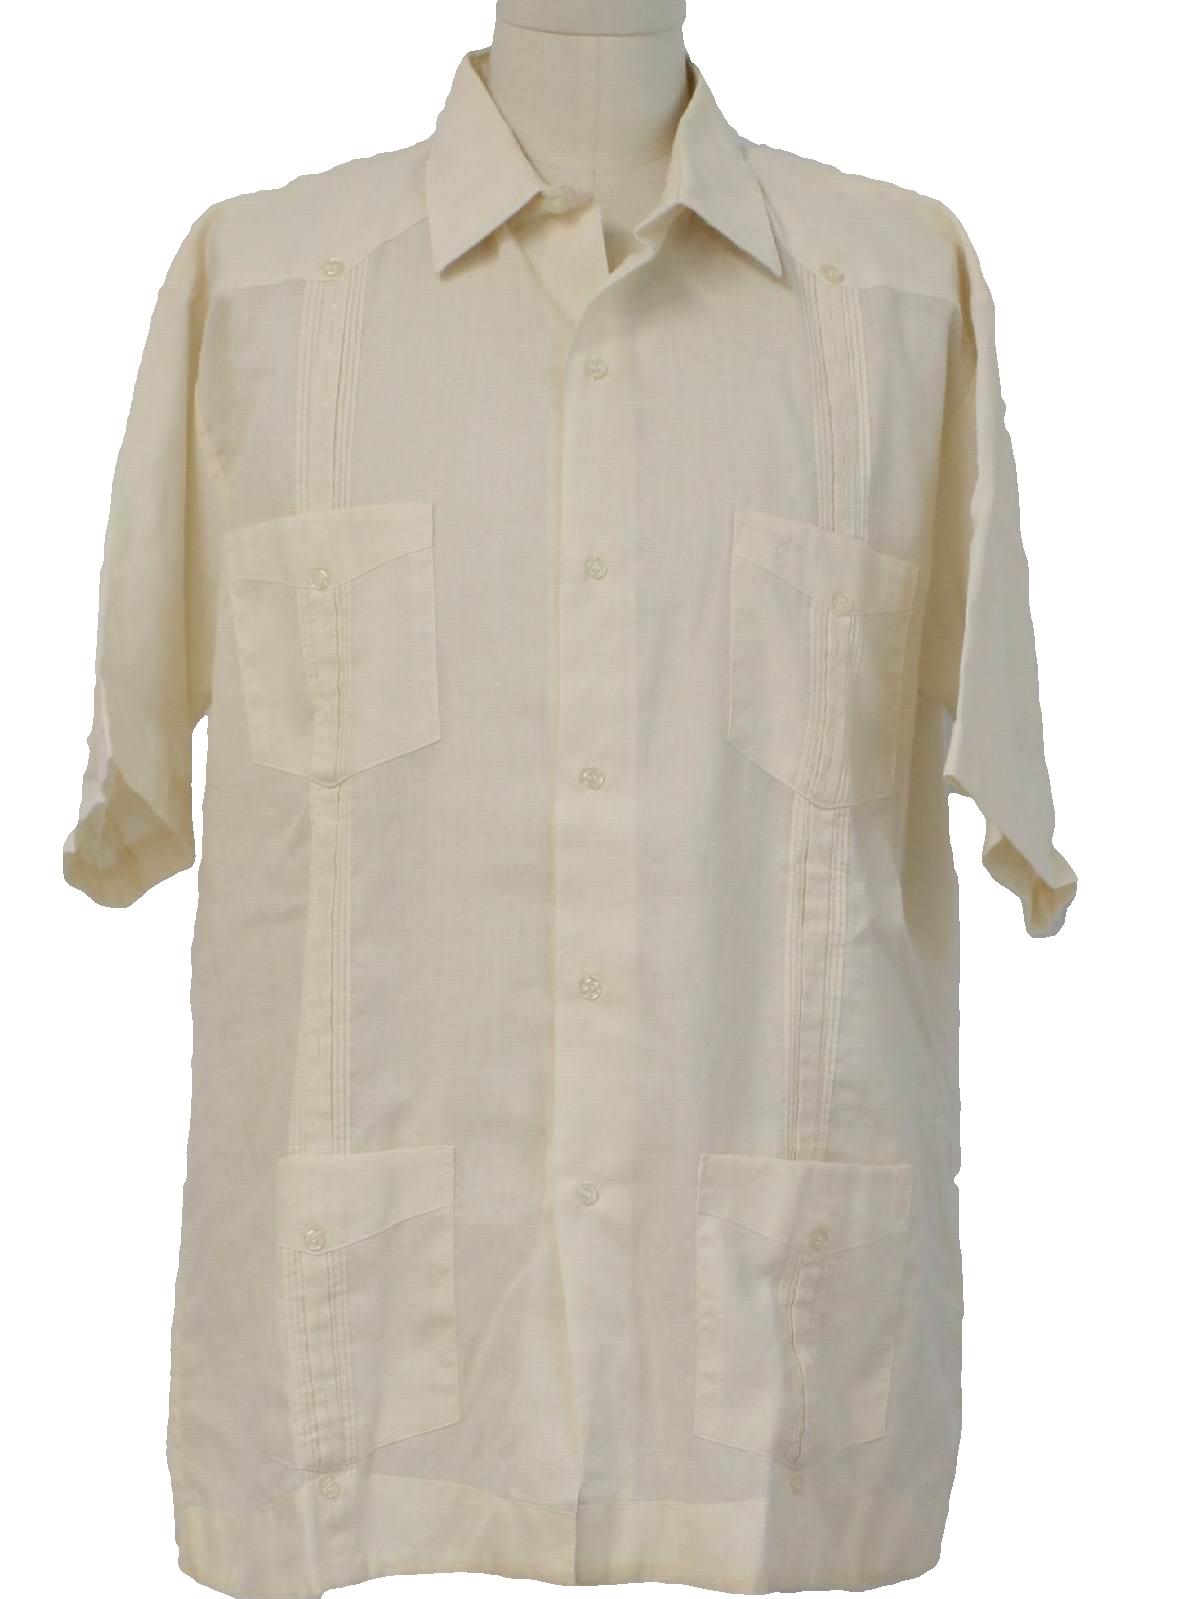 Mexican Wedding Shirt.1980 S Tropi Club Mens Guayabera Shirt